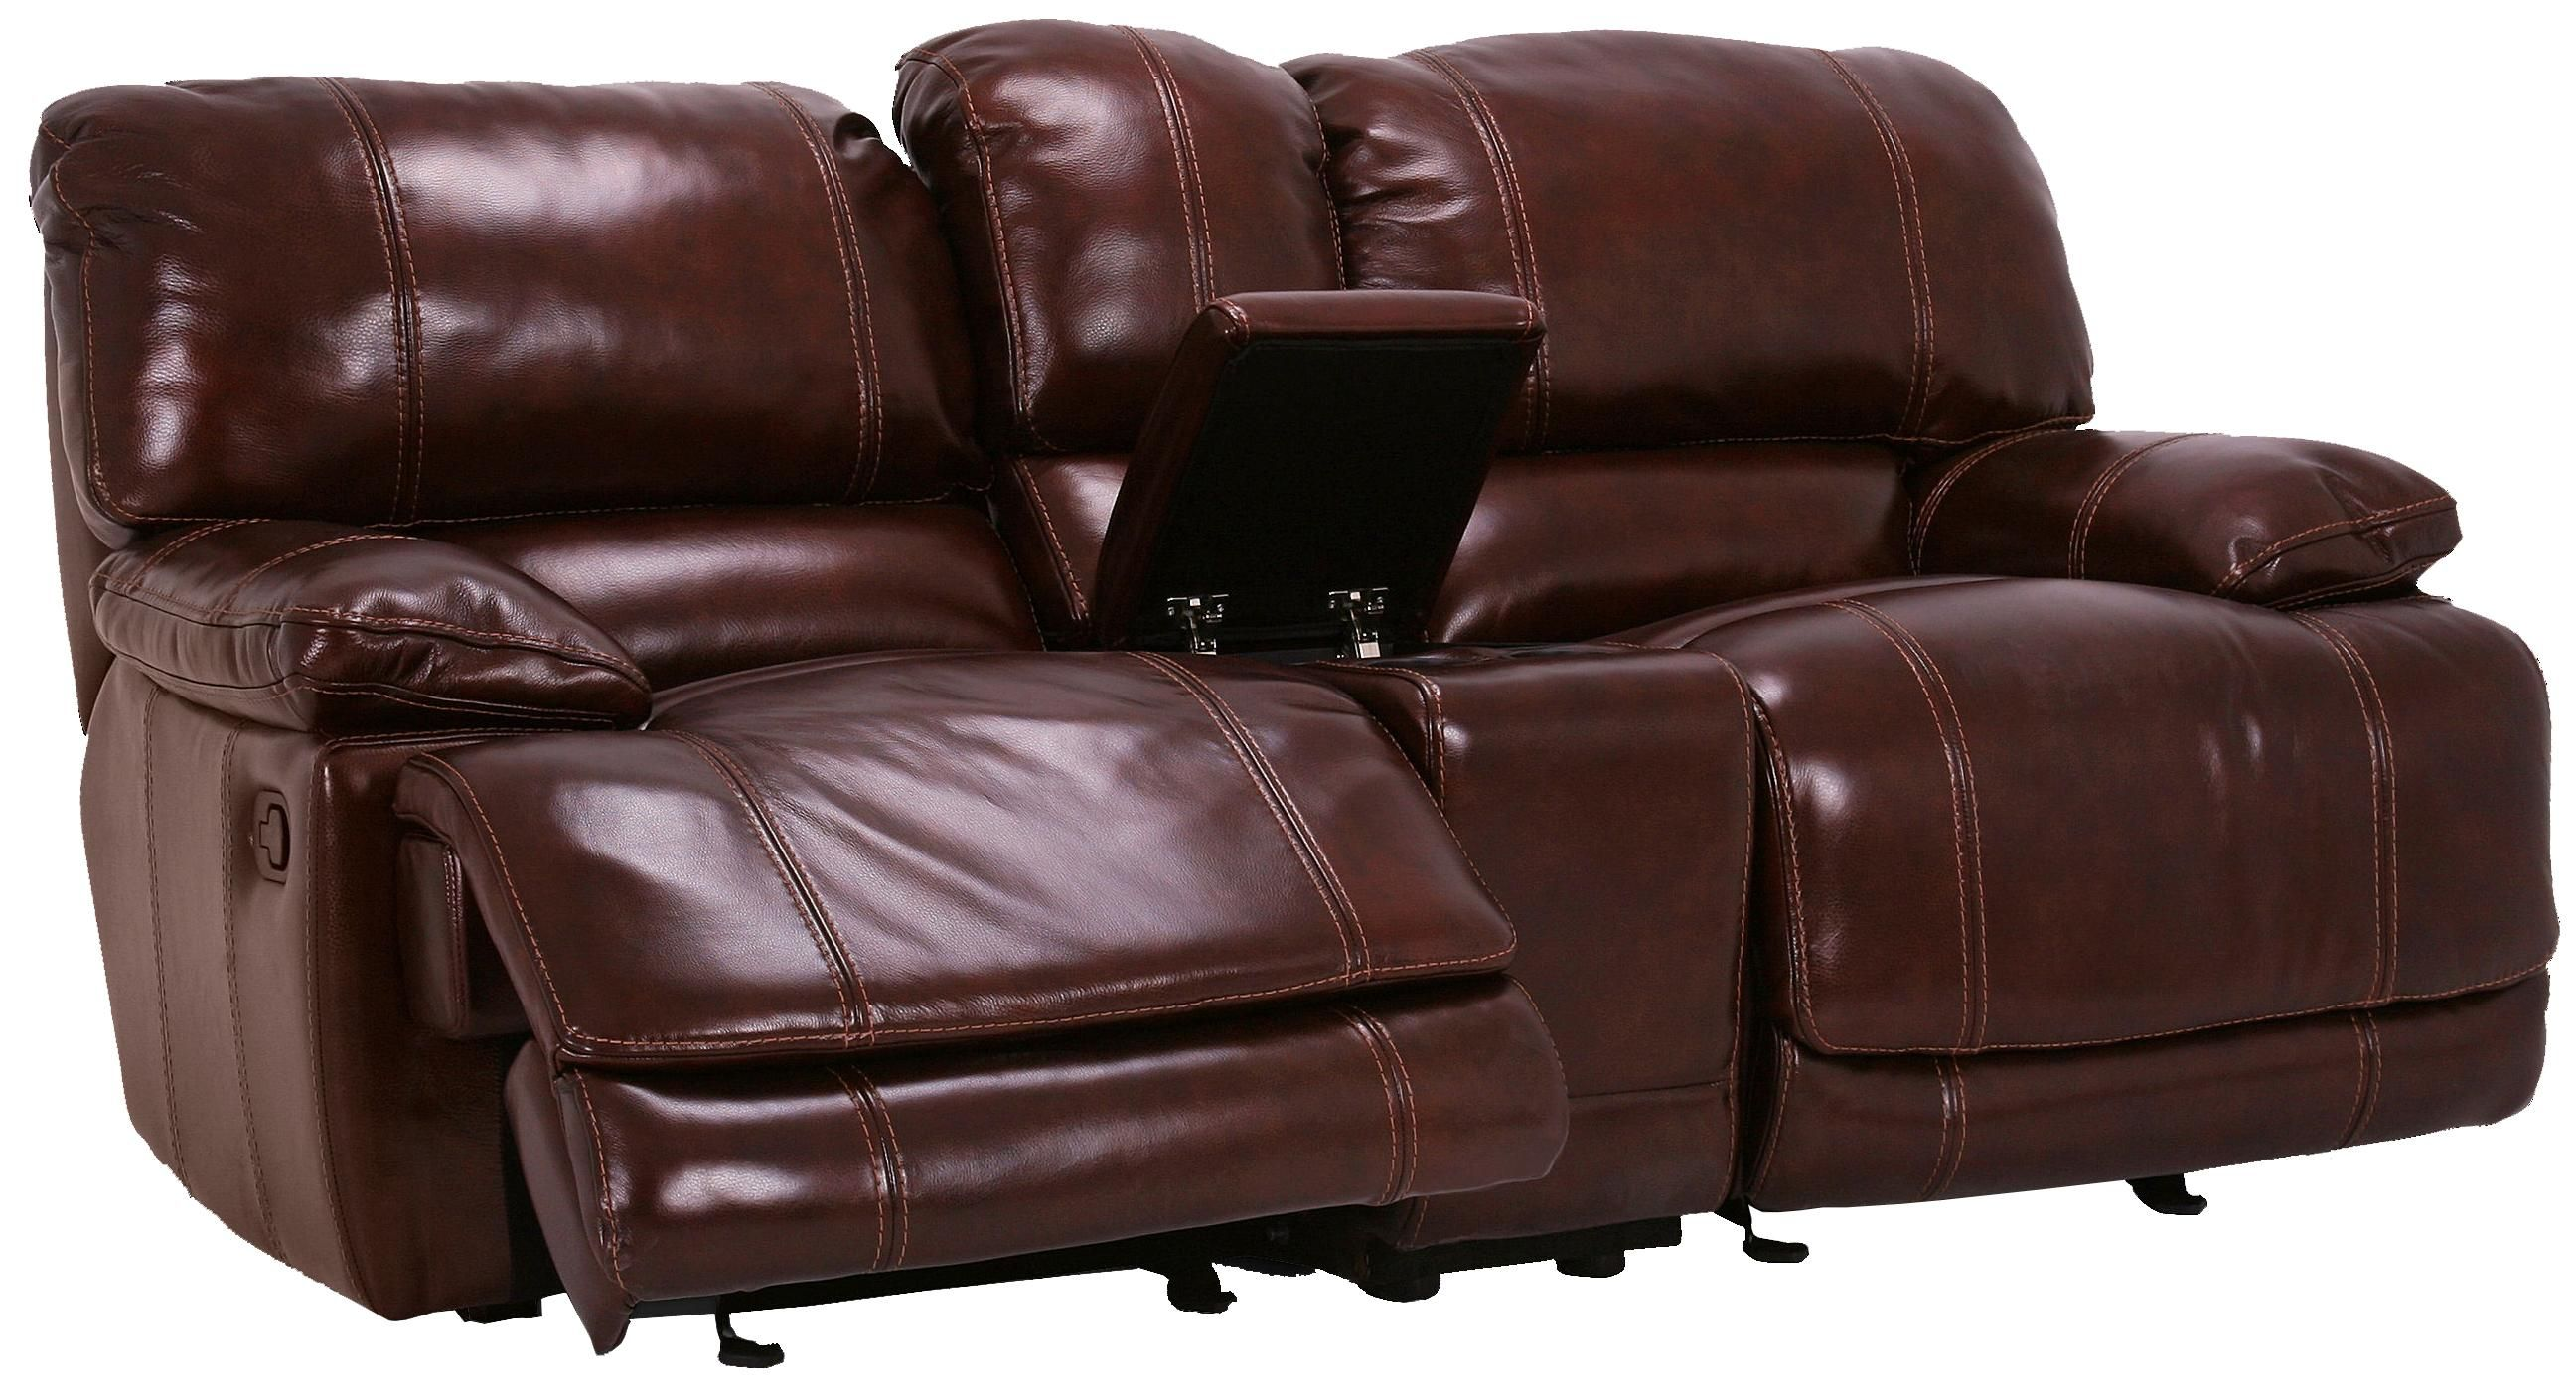 Flexsteel Furniture Latitudes Belmont Collection